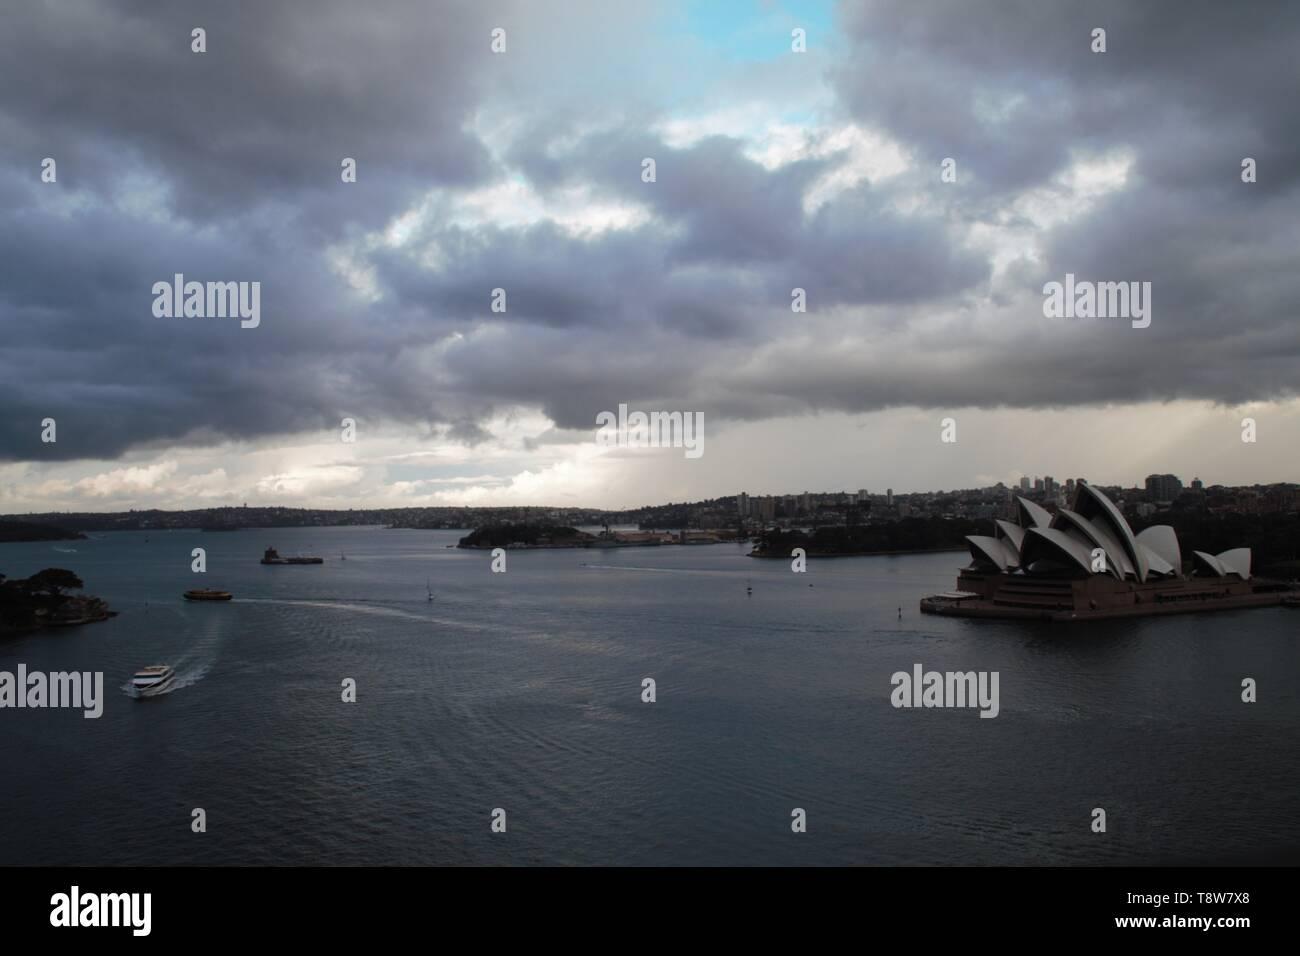 Sydney opera house before it starts to rain - Stock Image